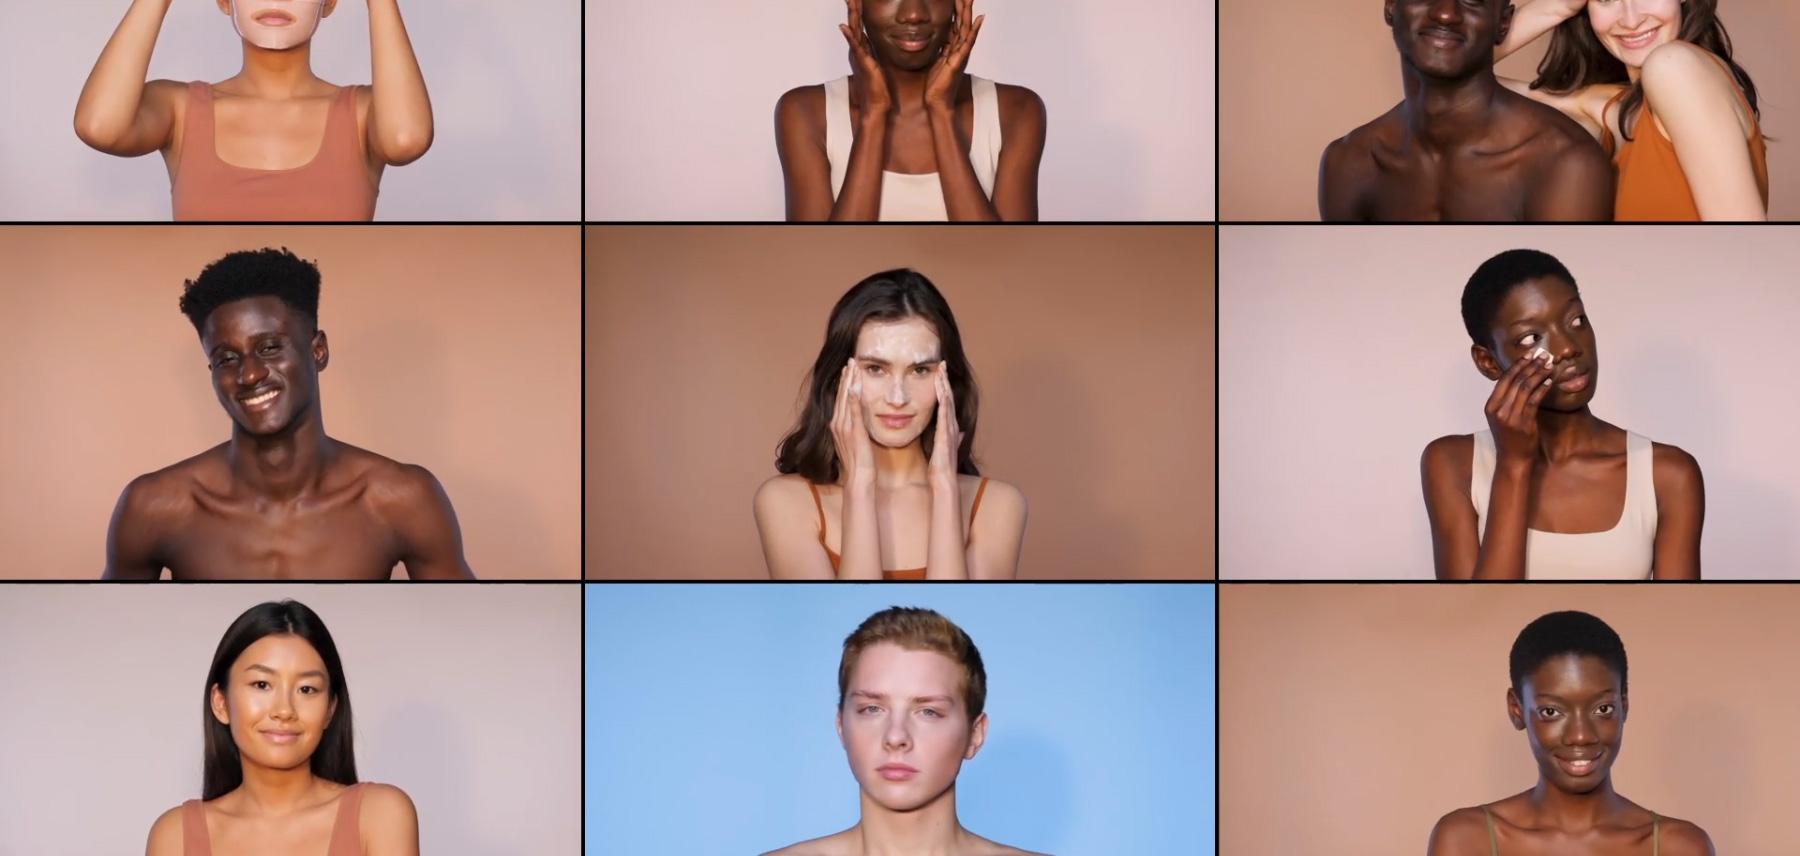 Hi, Skin - Website of the Day